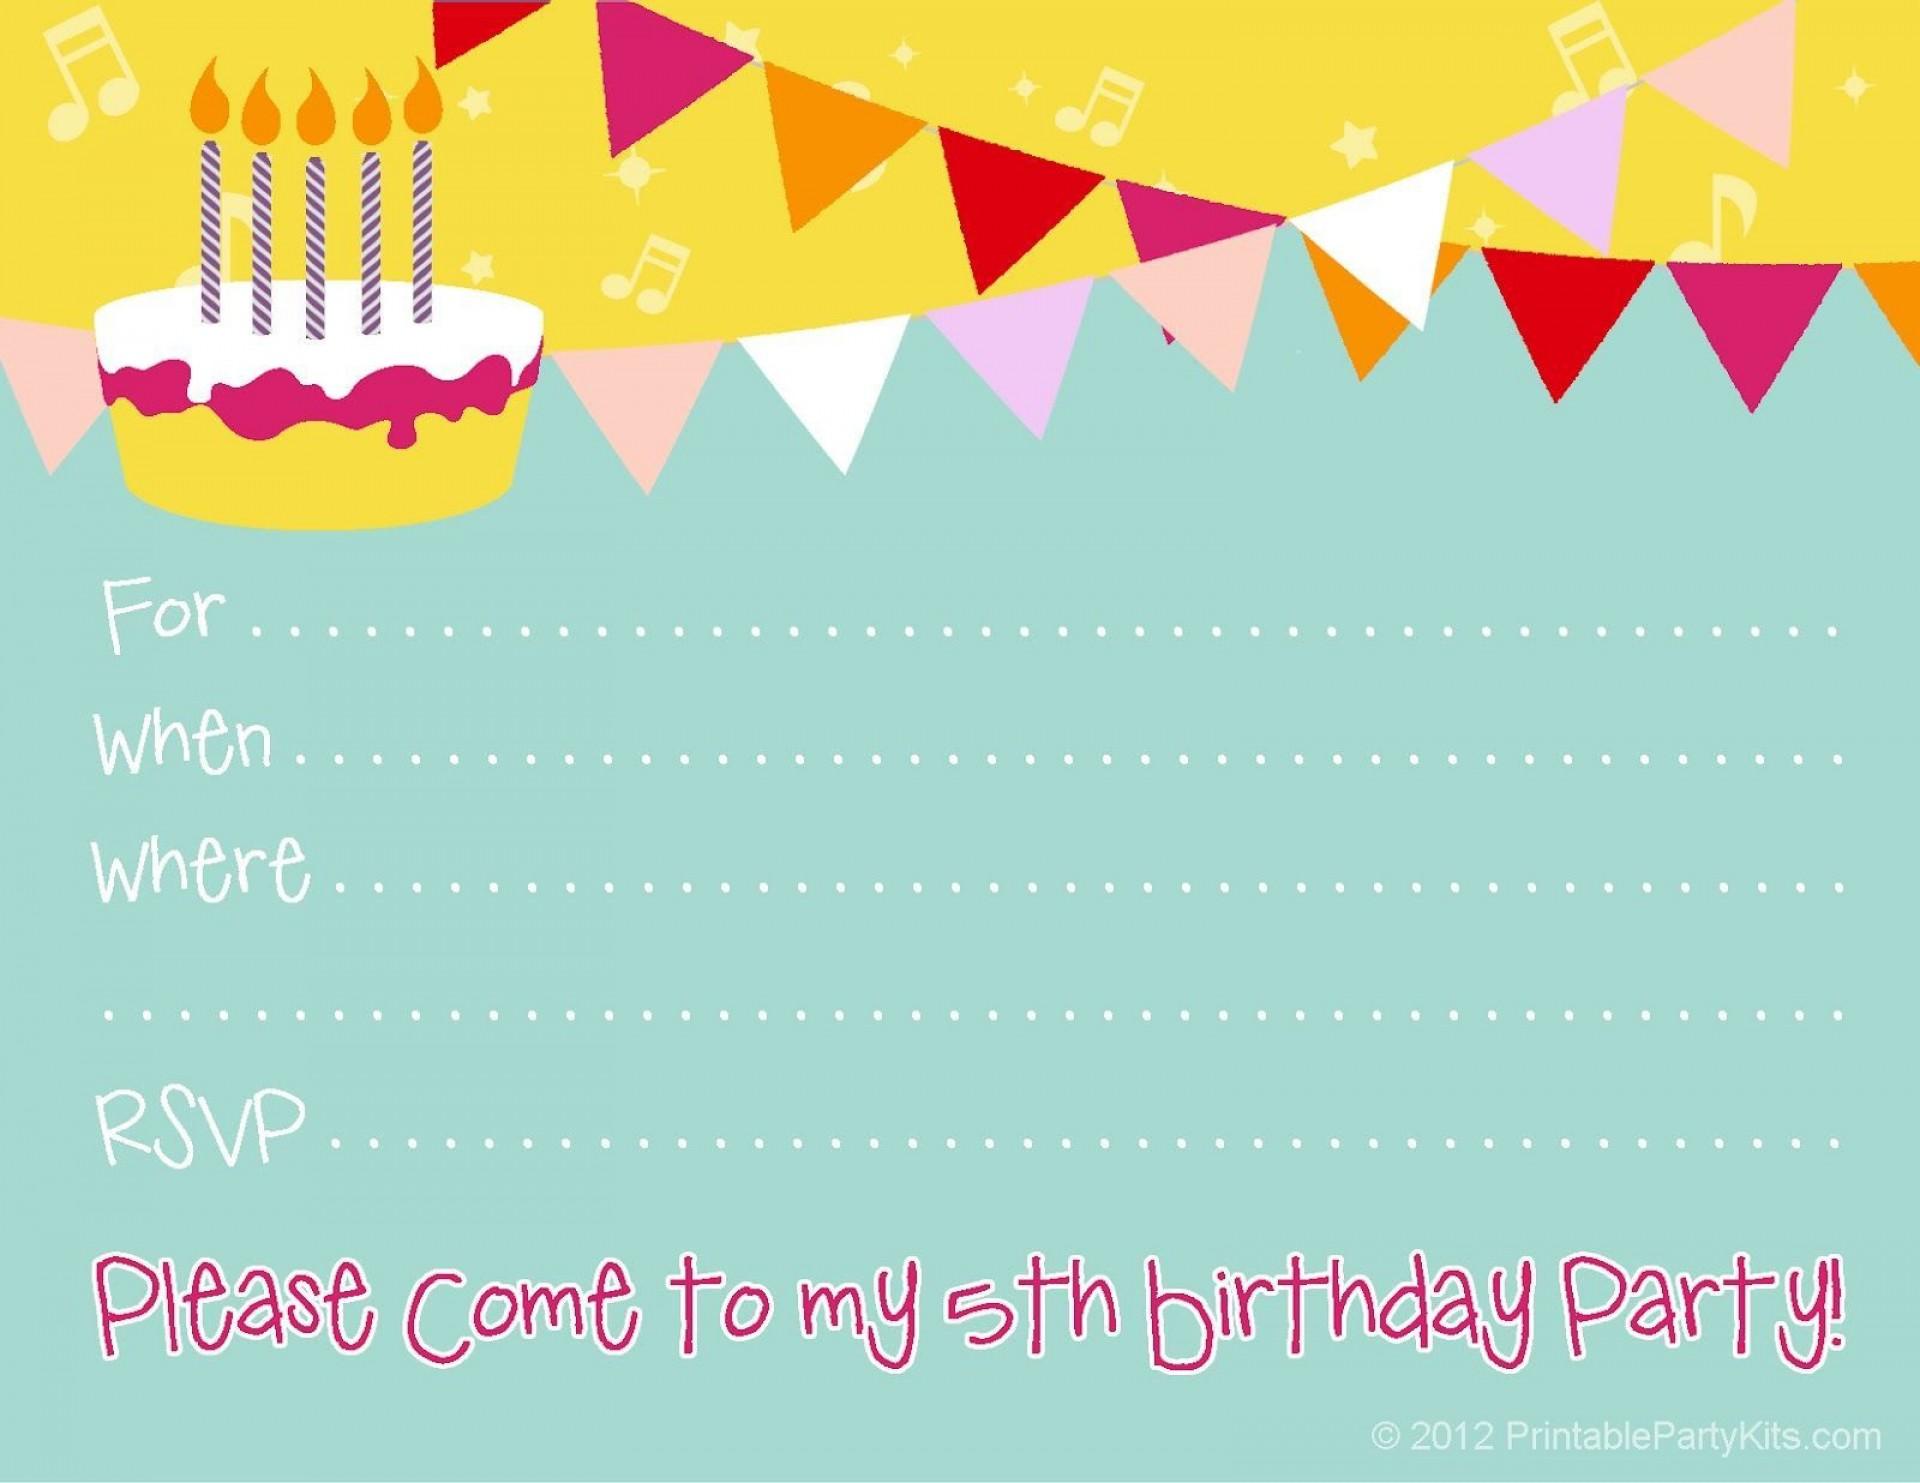 007 Dreaded Free Online Printable Birthday Invitation Template Design  Templates Card Maker1920